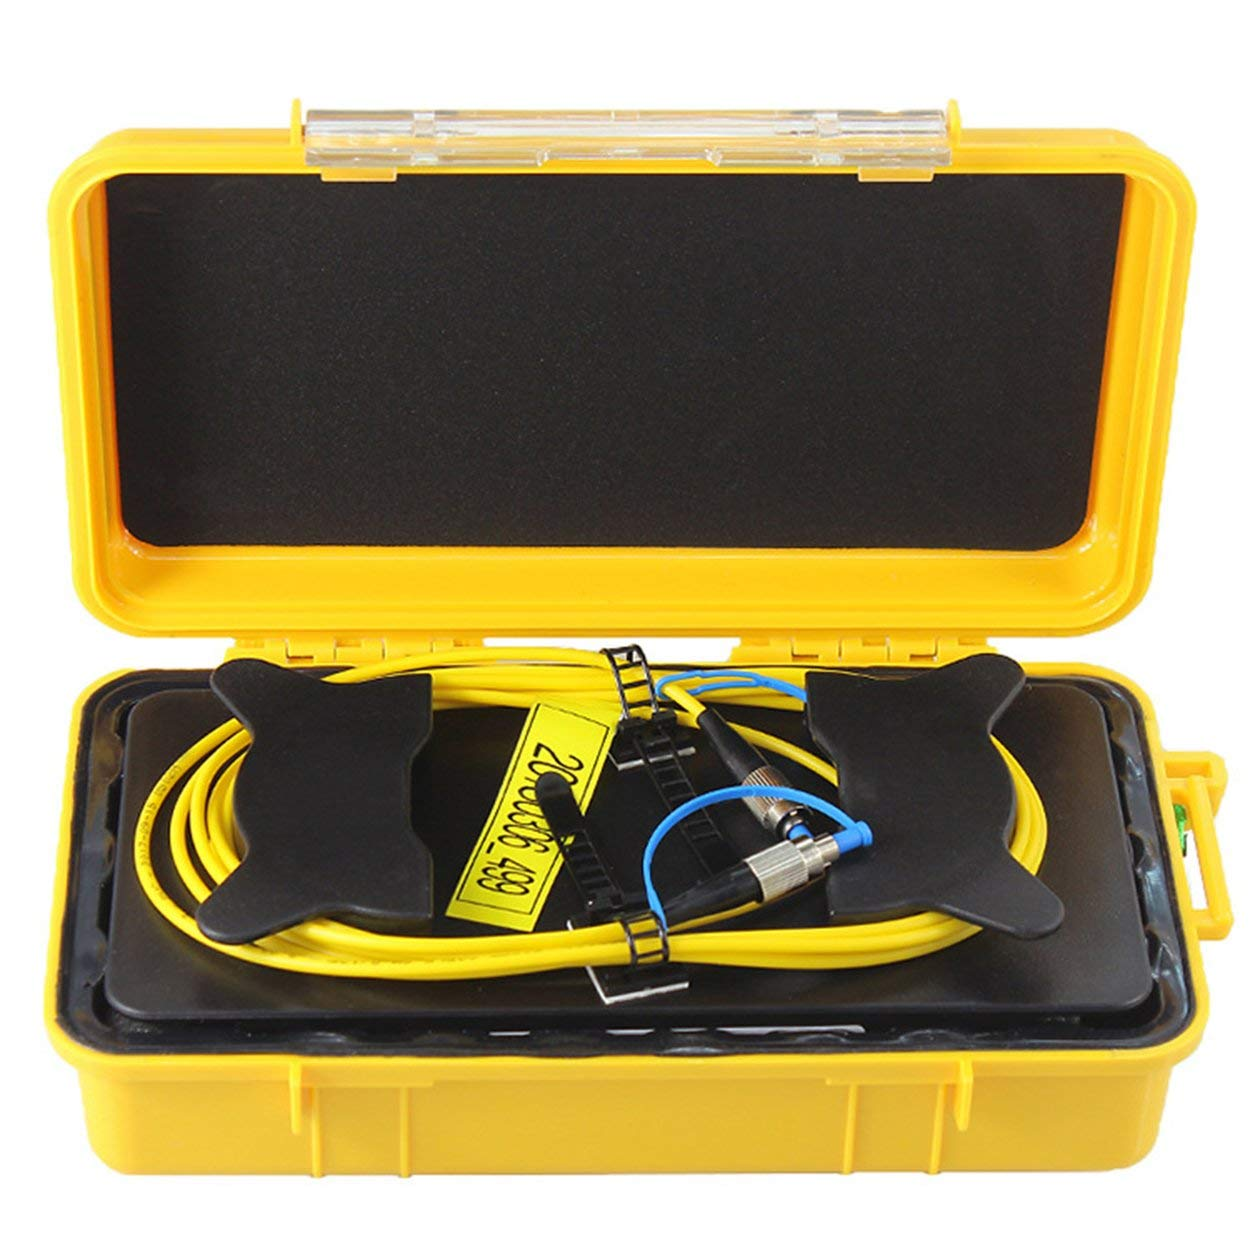 Lorenlli Fit FC/UPC-FC/UPC Professional Single Mode 2000M OTDR Launch Cable Box Fiber Ring OTDR Launch Fiber Optic Cable